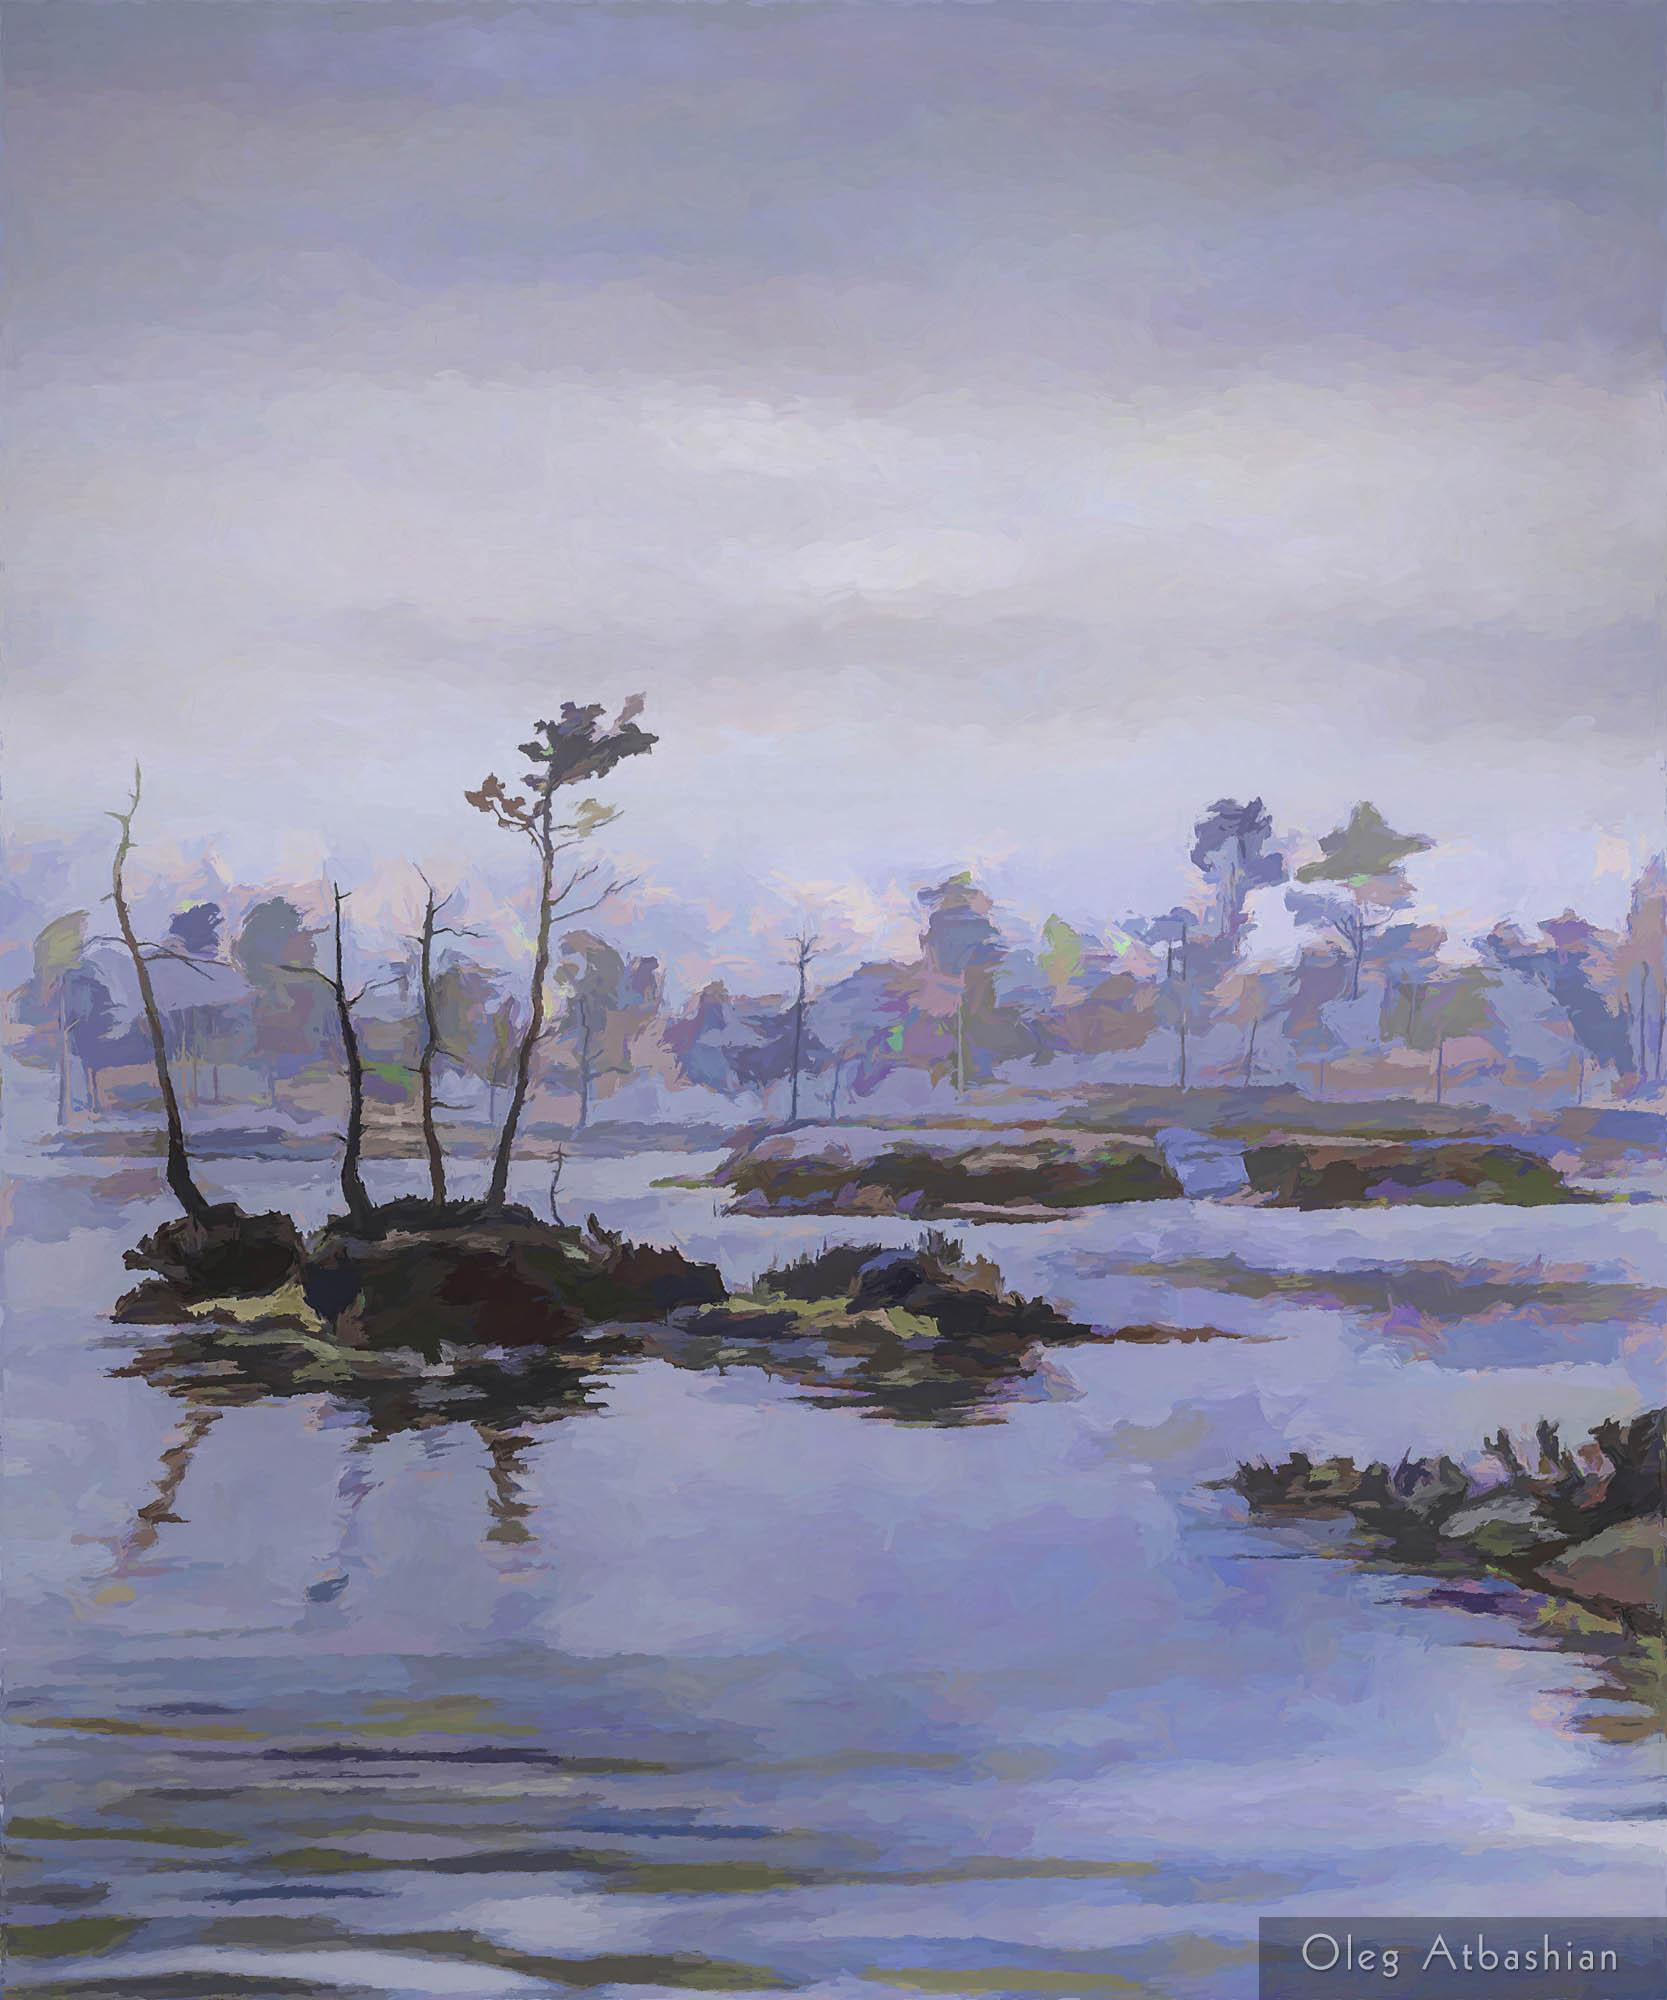 Unnamed Swamp in Siberia.